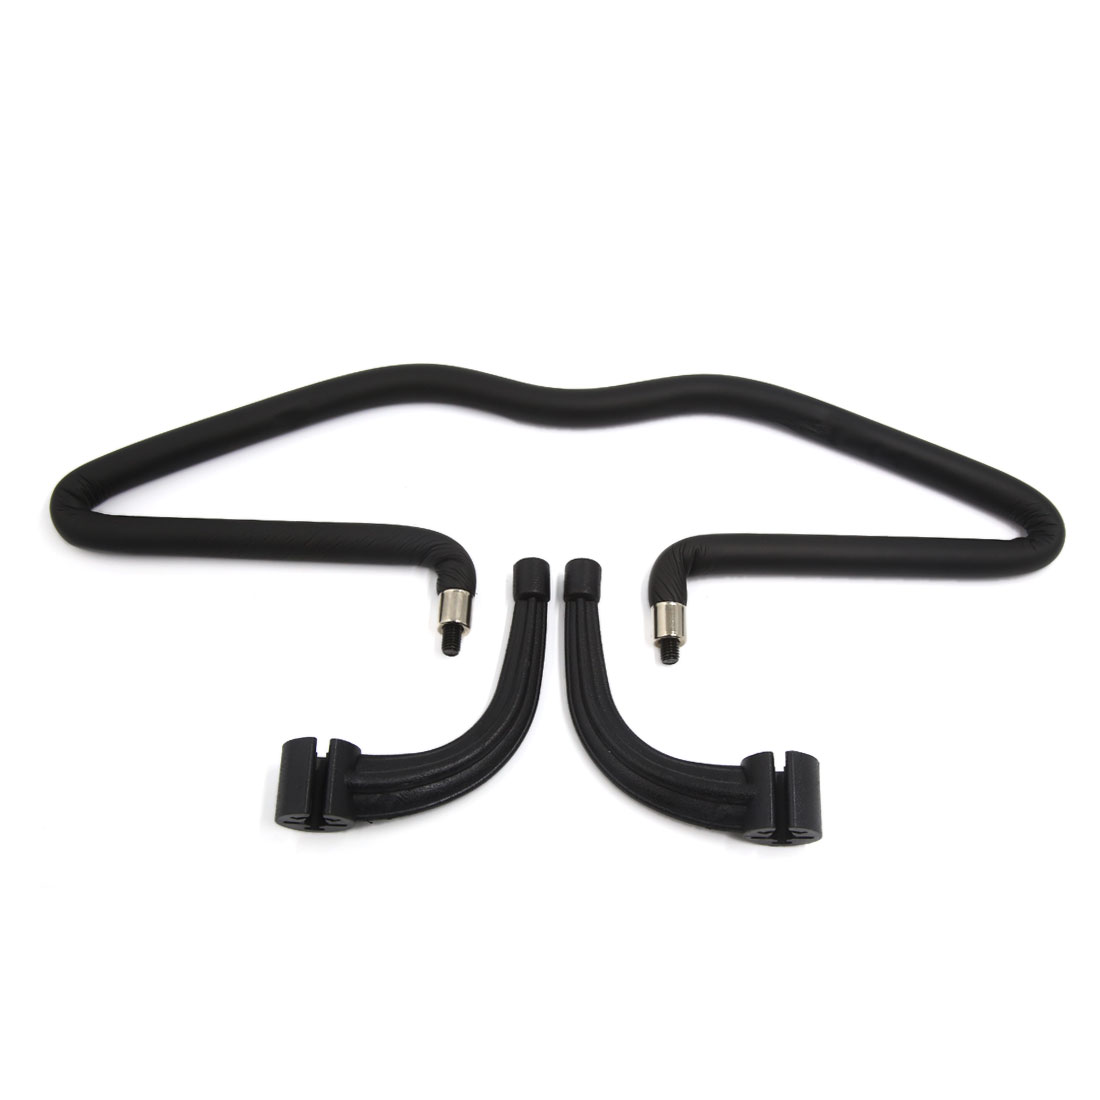 Black Rubber Seat Headrest Jacket Coat Suit Clothes Hanger Holder for Car